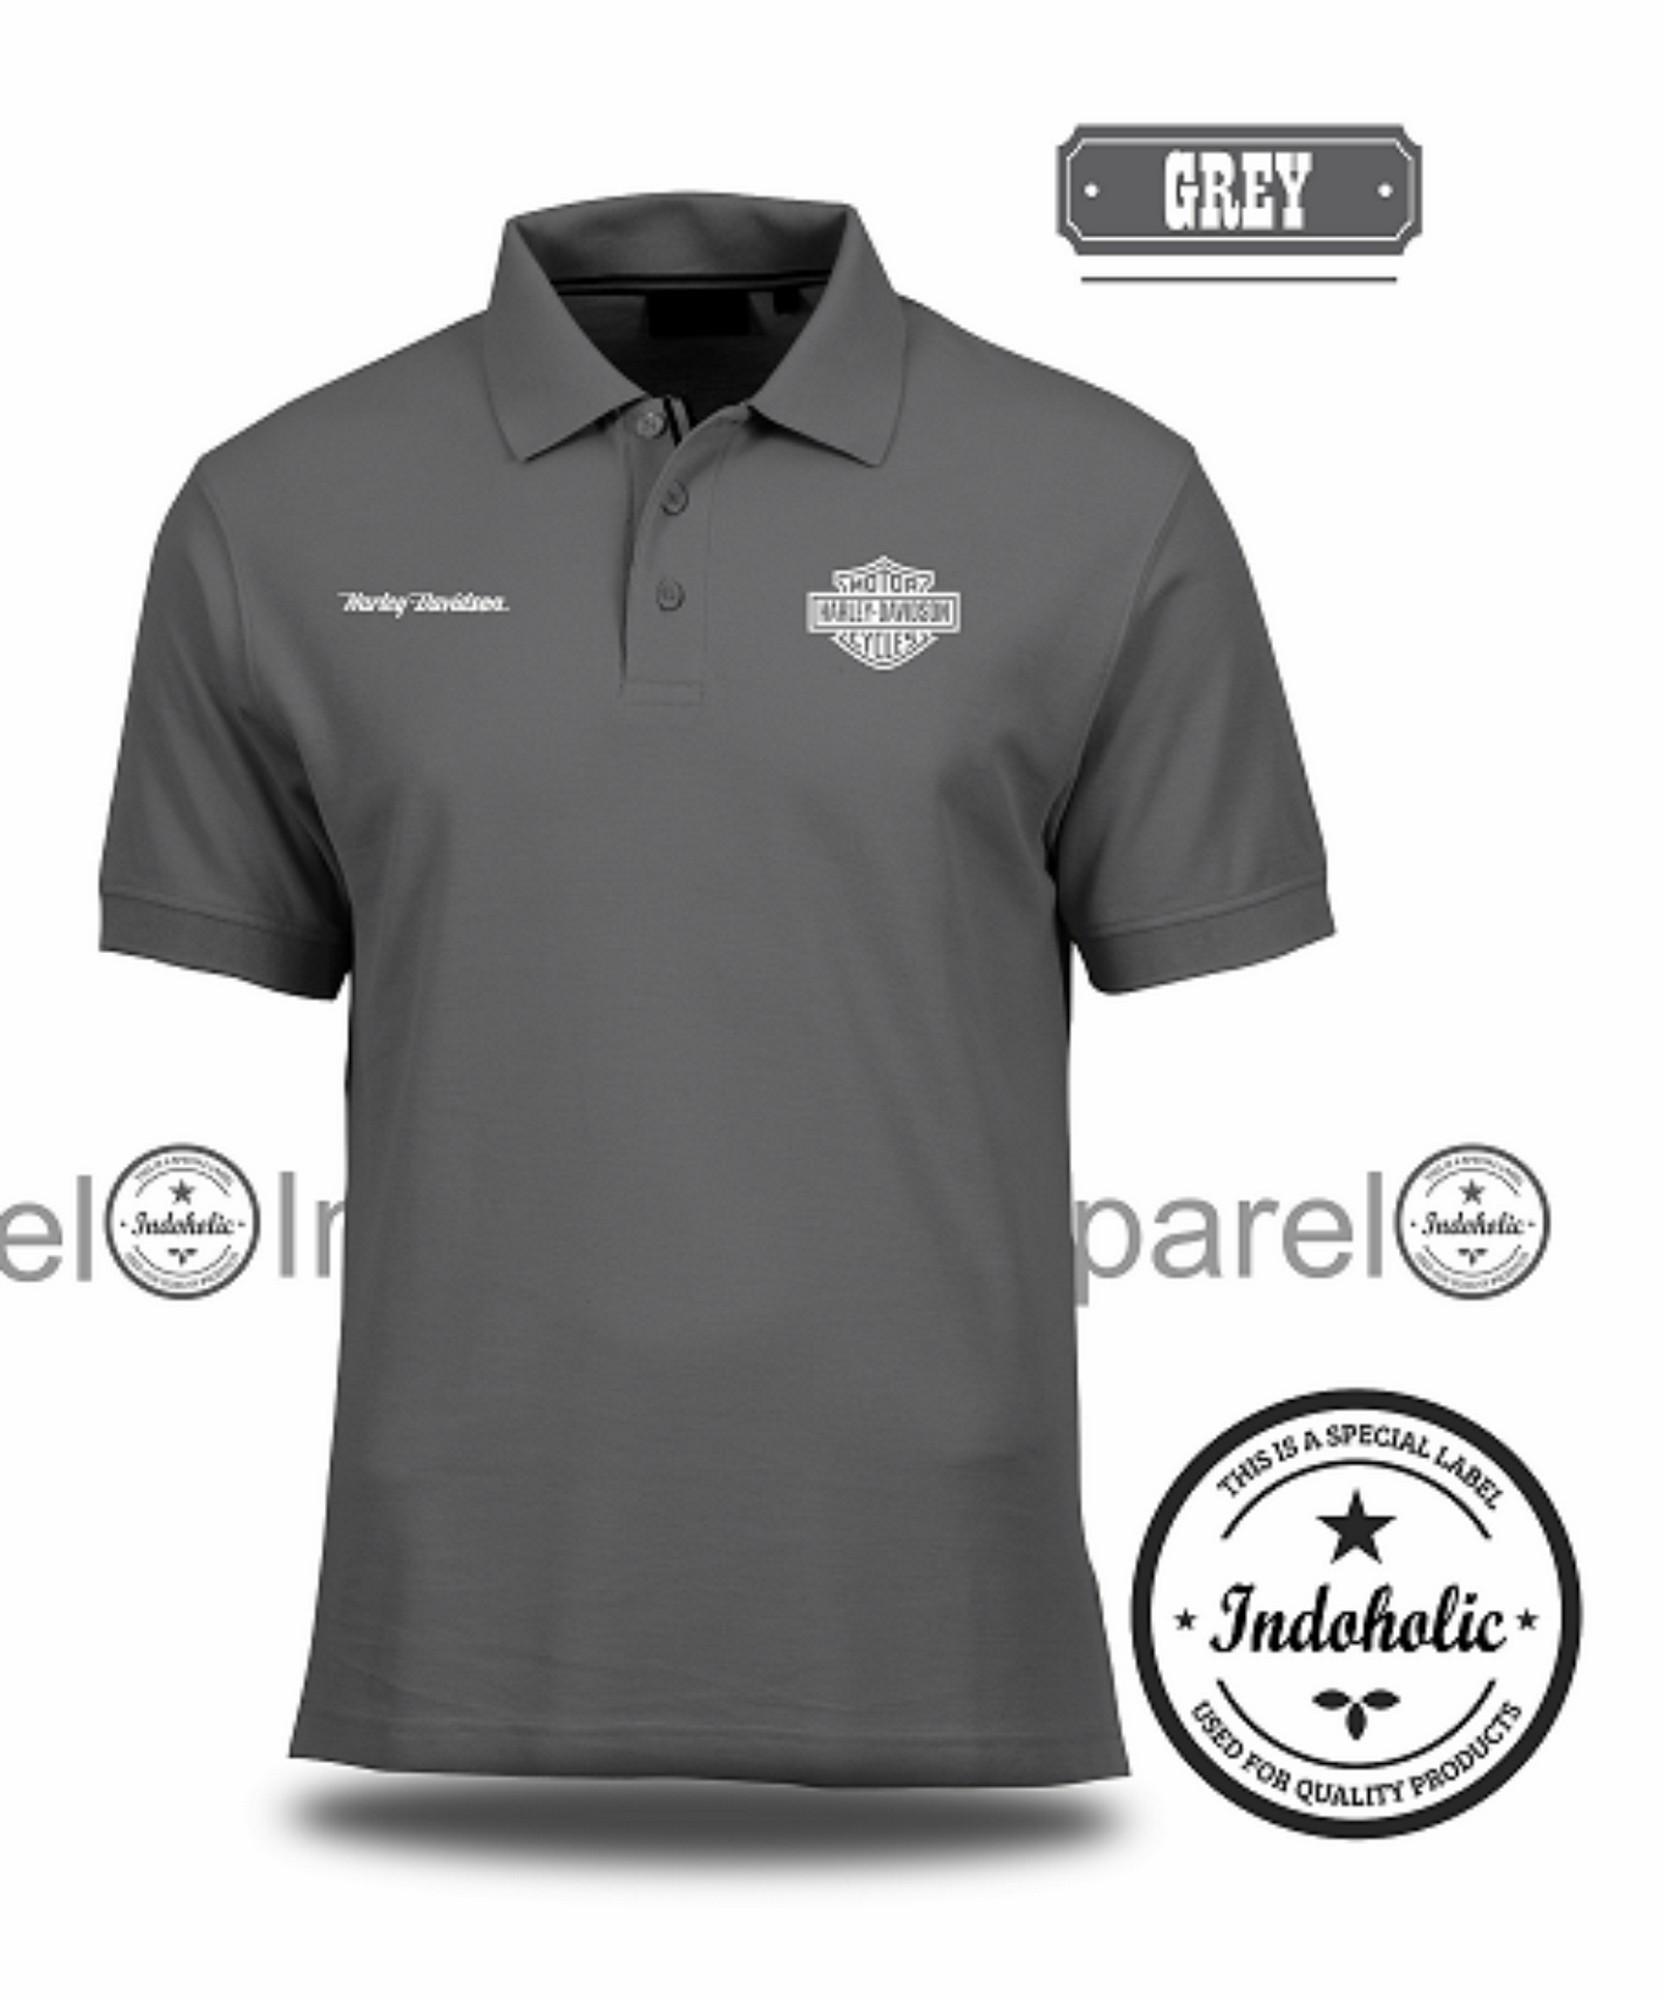 Polo Shirt Kaos Distro Motor Harley Davidson T-Shirt Fashion Pria Wanita Cowo Cewe Baju T Shirt Jakarta Bandung Terbaru Baru Jaman Now Kekinian Atasan Pakaian Polos Pendek Kerah Berkerah Lacos Pique Lacost Formal Casual Korean Murah Bagus